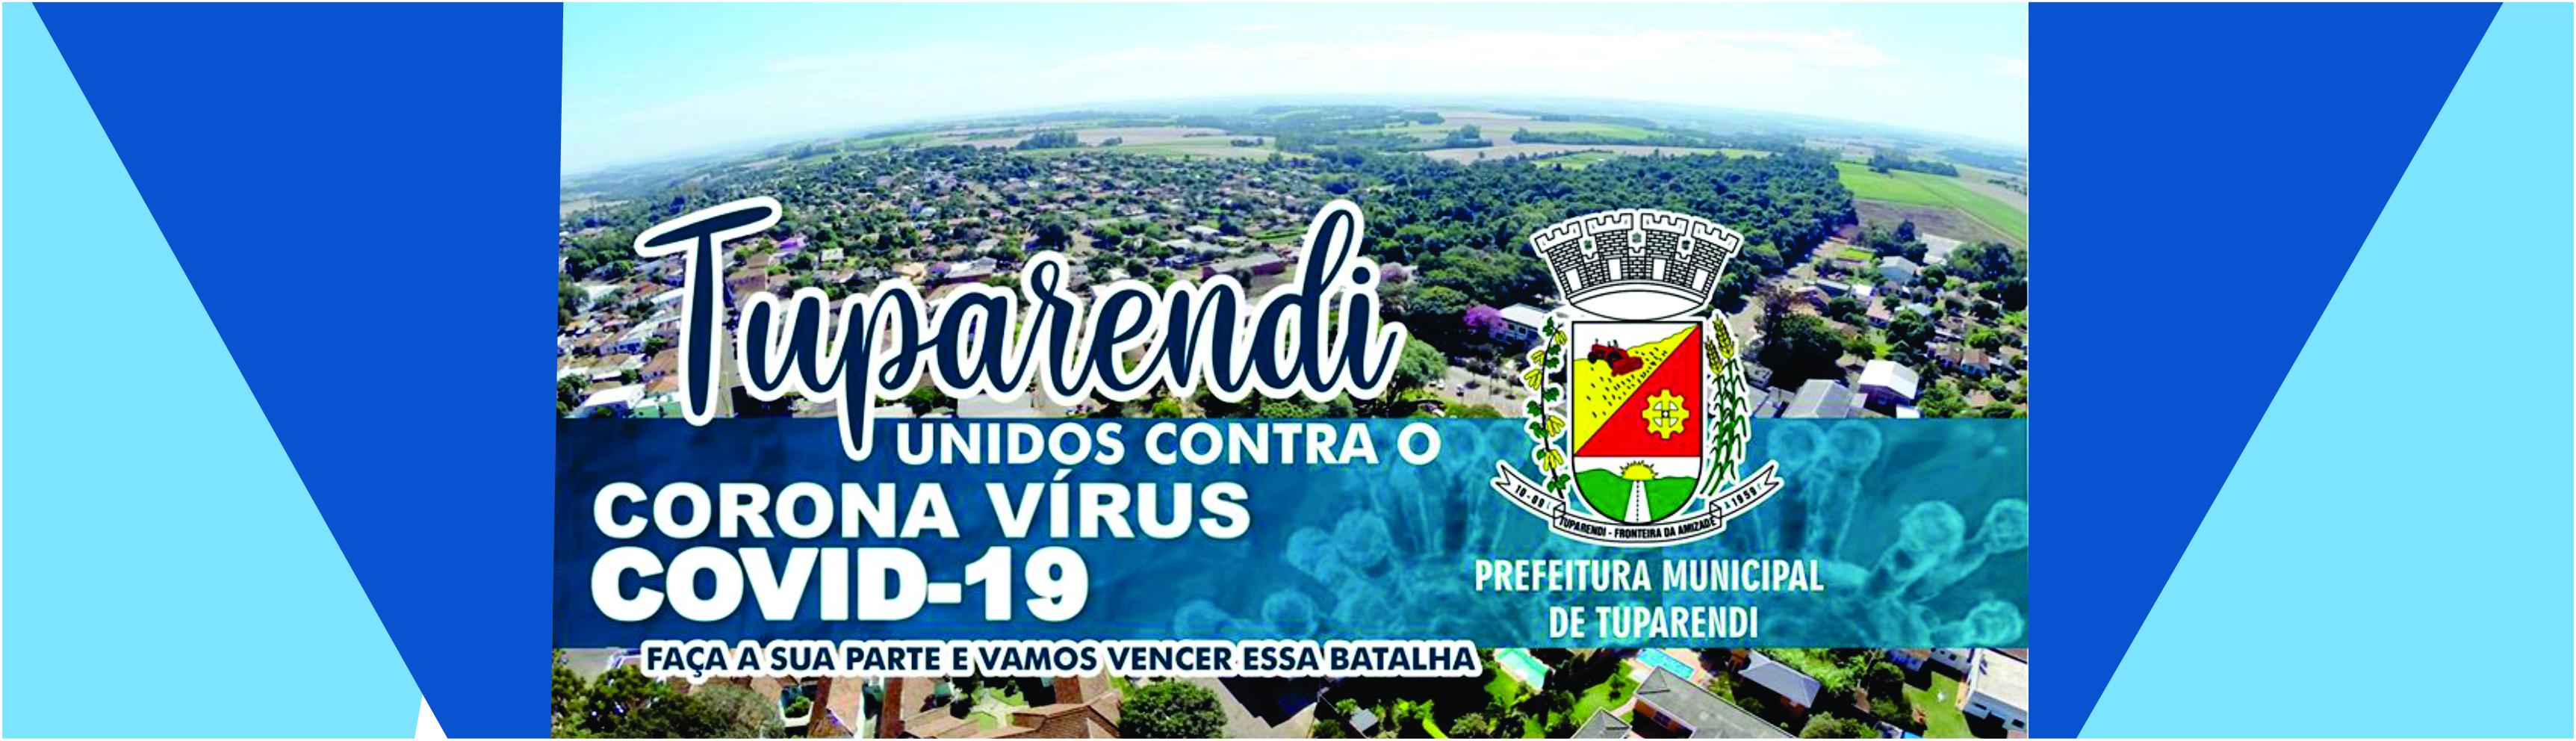 Prefeitura Municipal de Tuparendi - RS